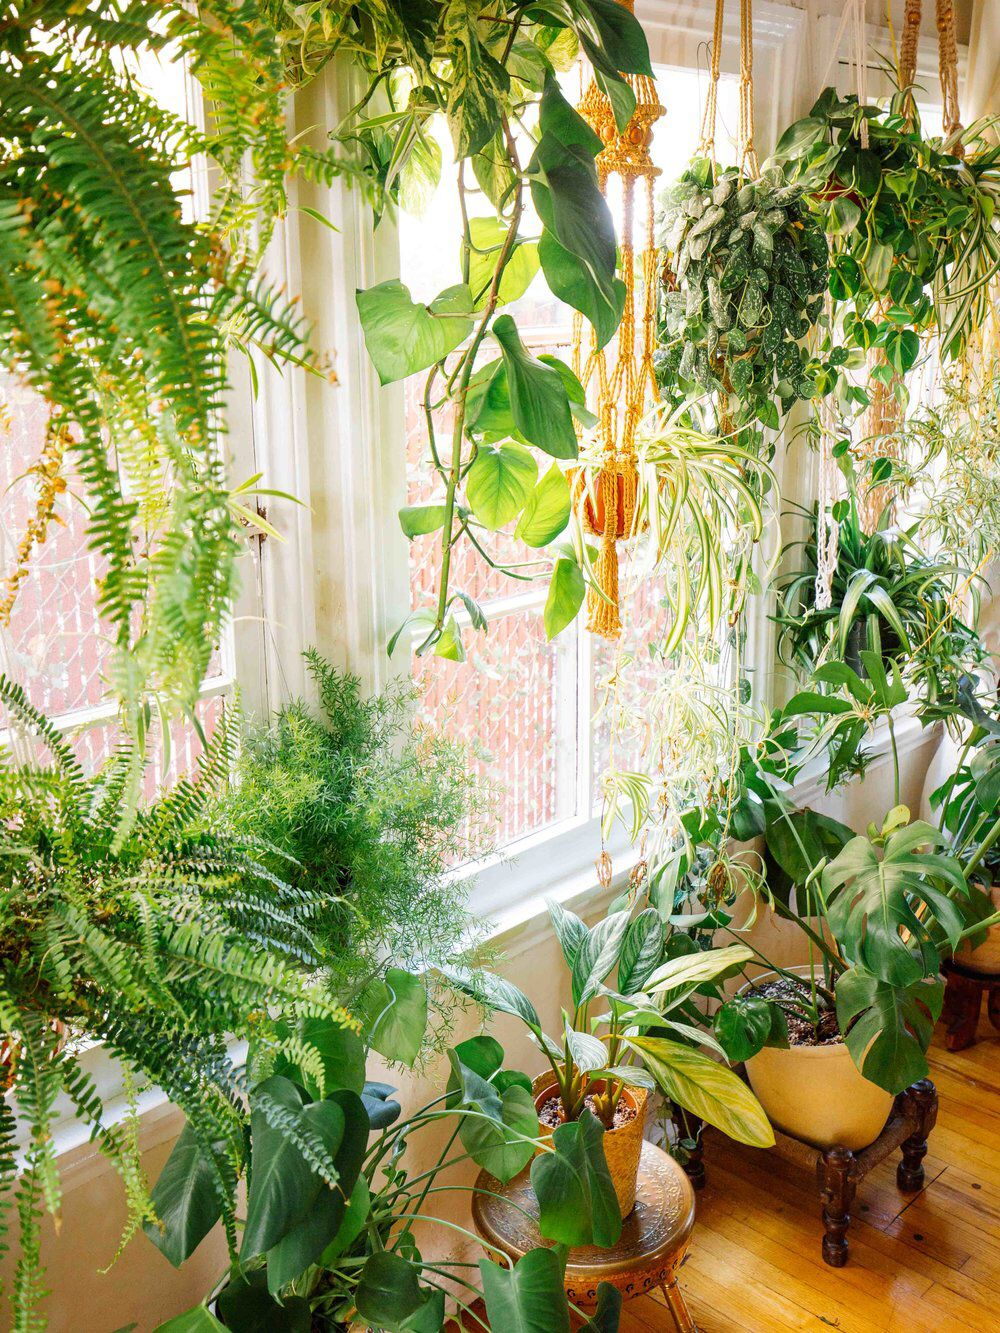 » Plant Life » Indoor Houseplants » Boho Decor » Jungalow 400 x 300